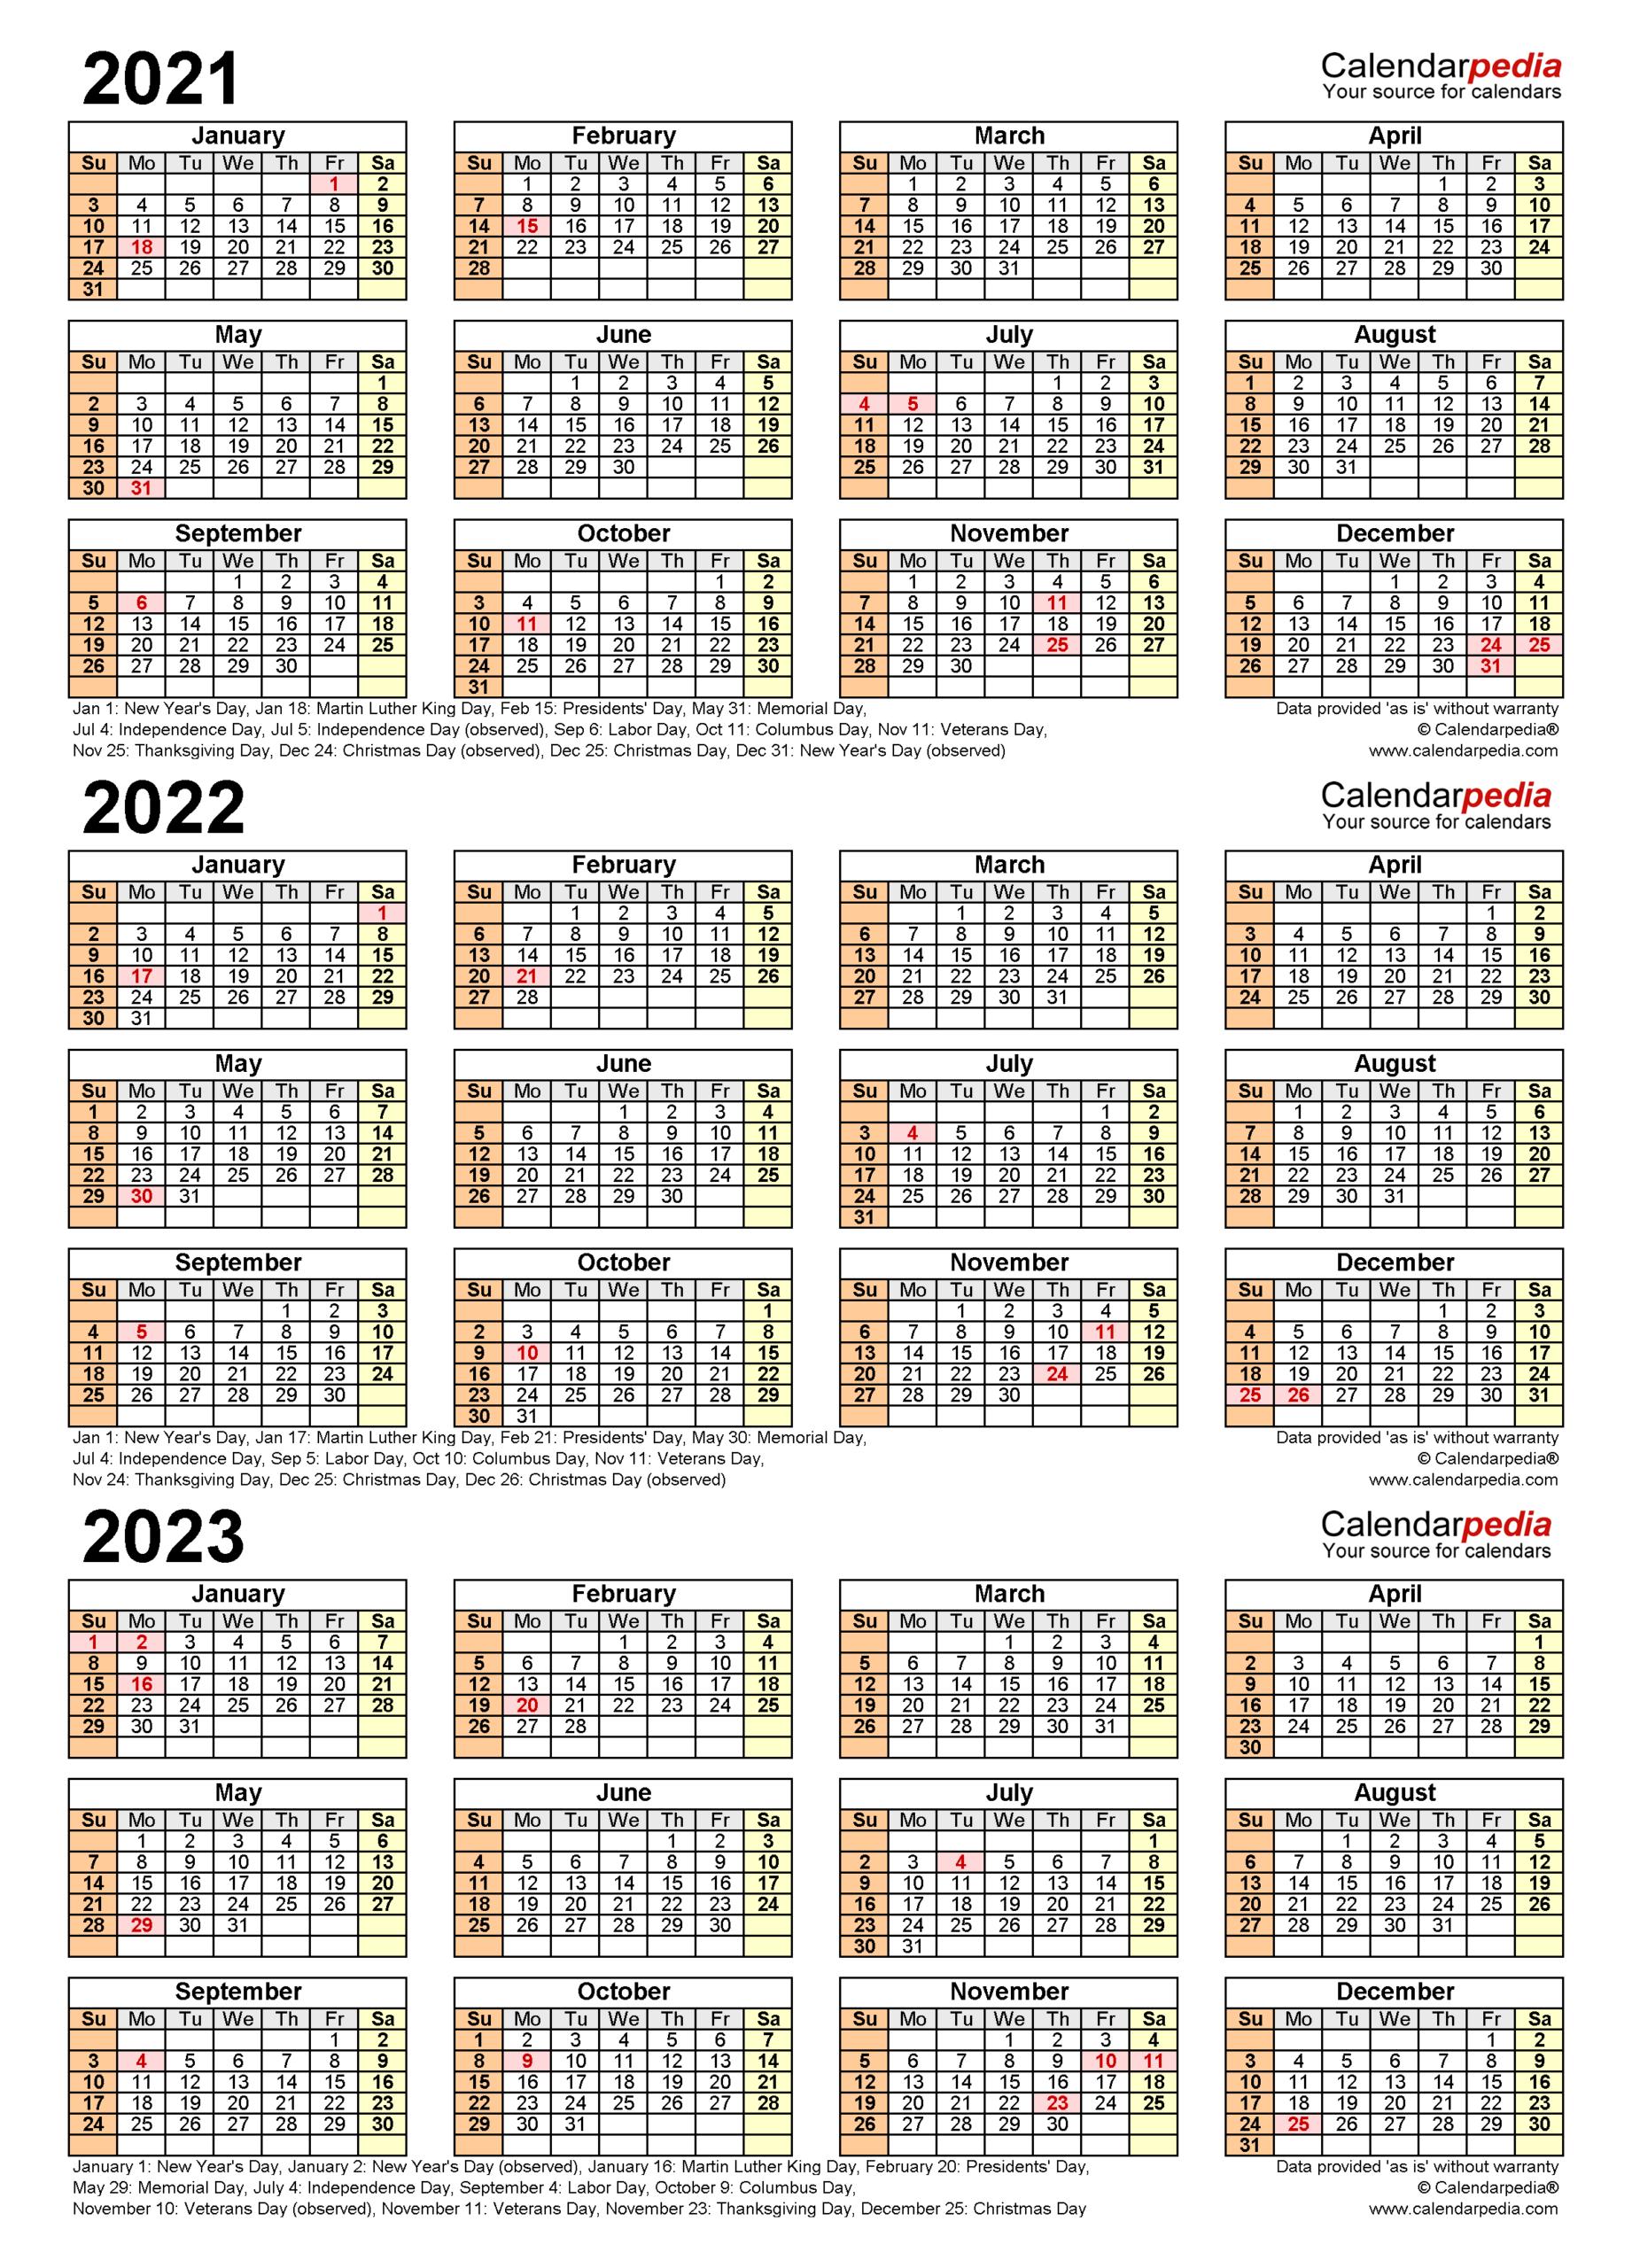 2021-2023 Three Year Calendar - Free Printable Excel Templates inside 2021-2022 Three Year Planner: 3 Year